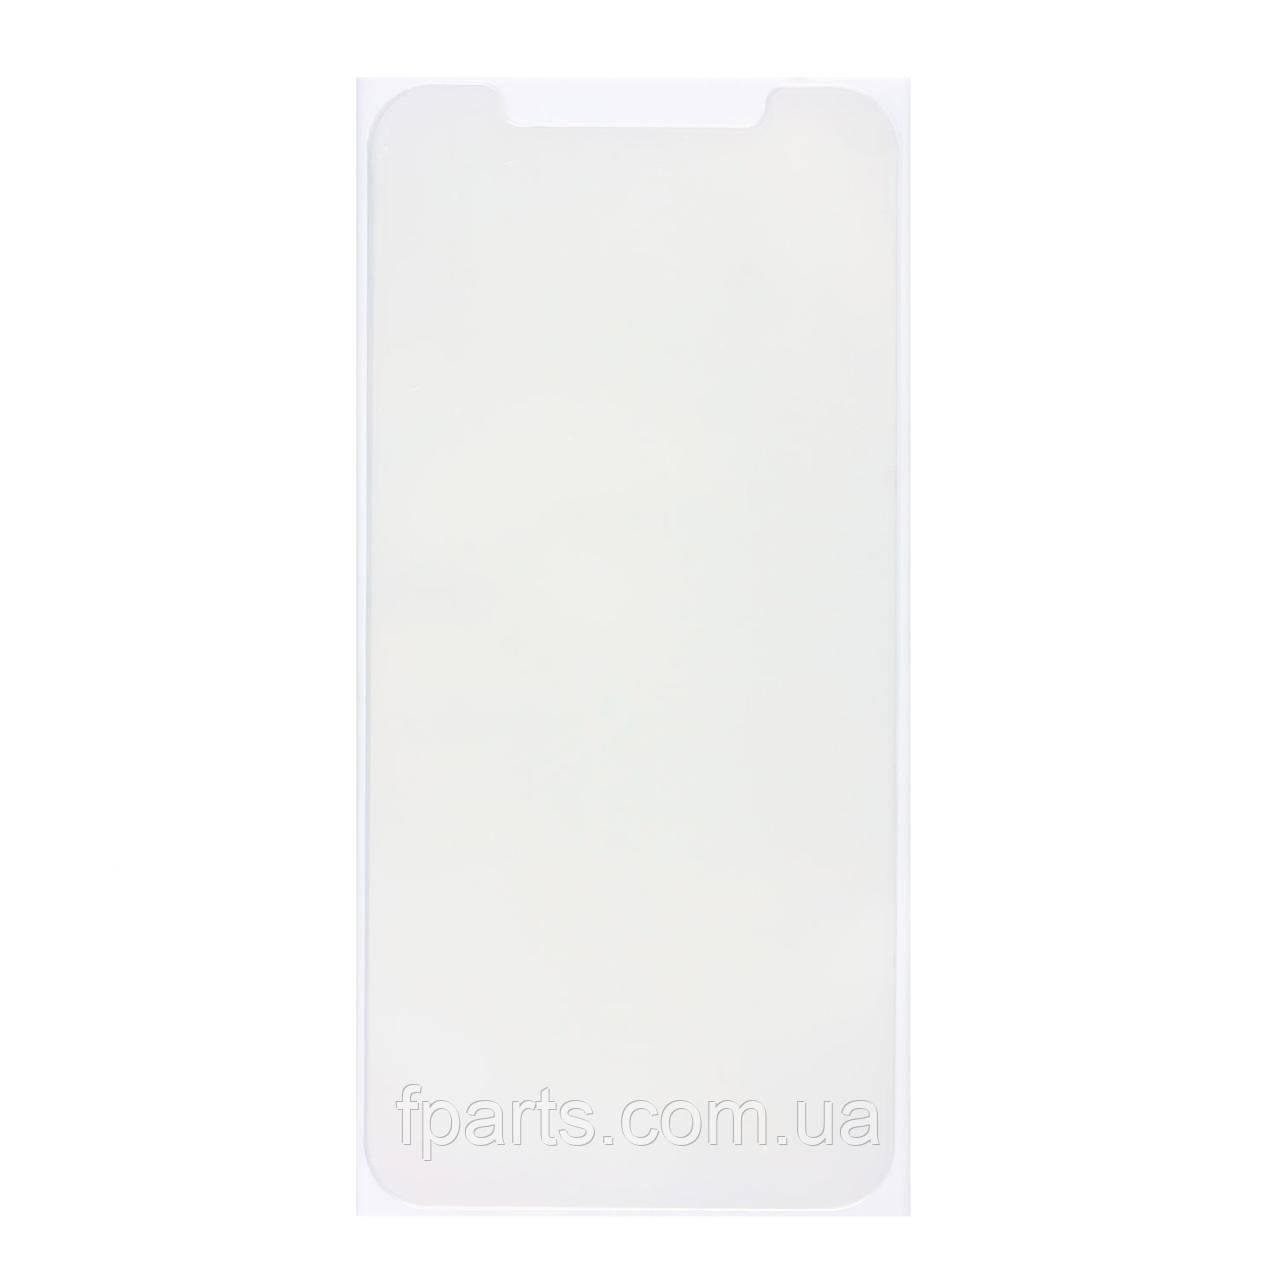 OCA Плівка для iPhone X